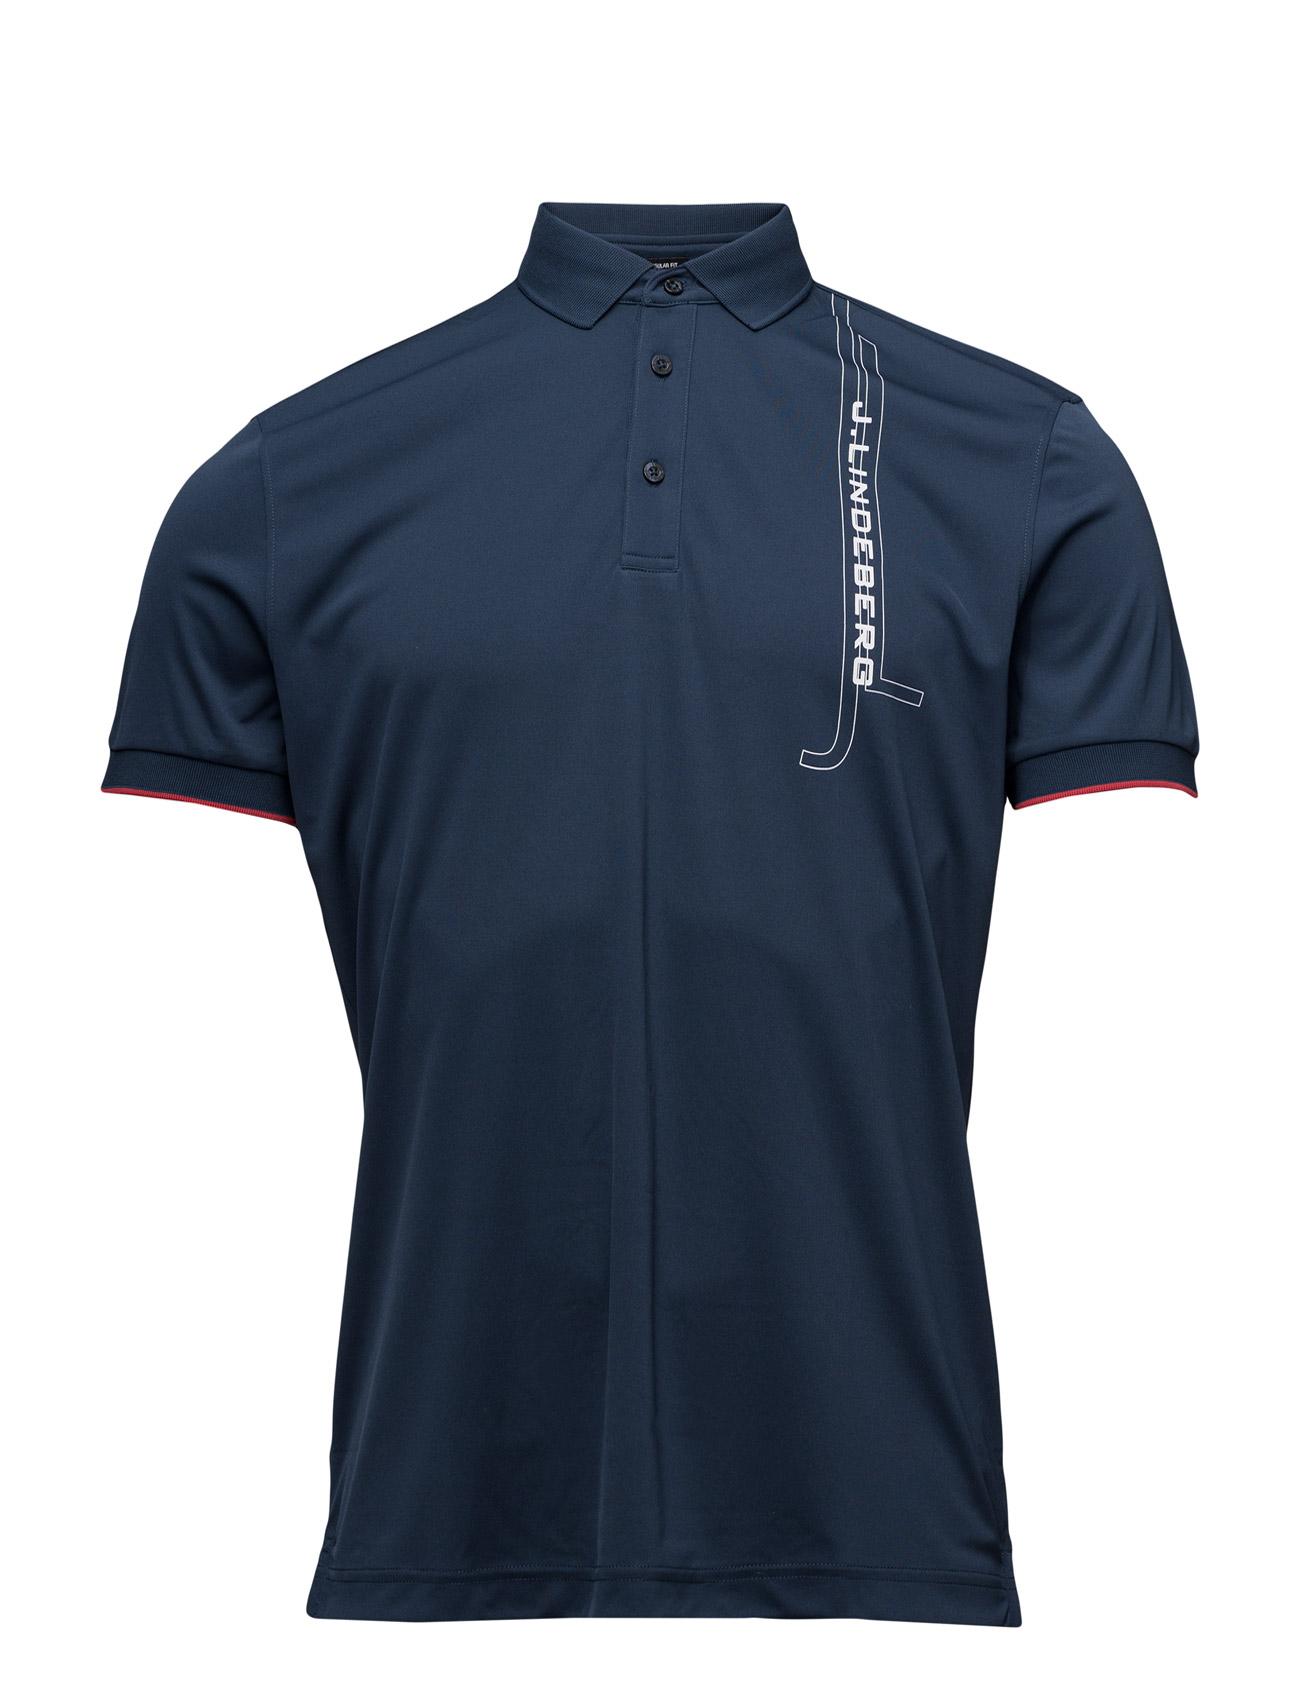 M Truls Reg Tx Jersey J. Lindeberg Golf Golf polo t-shirts til Mænd i Navy blå